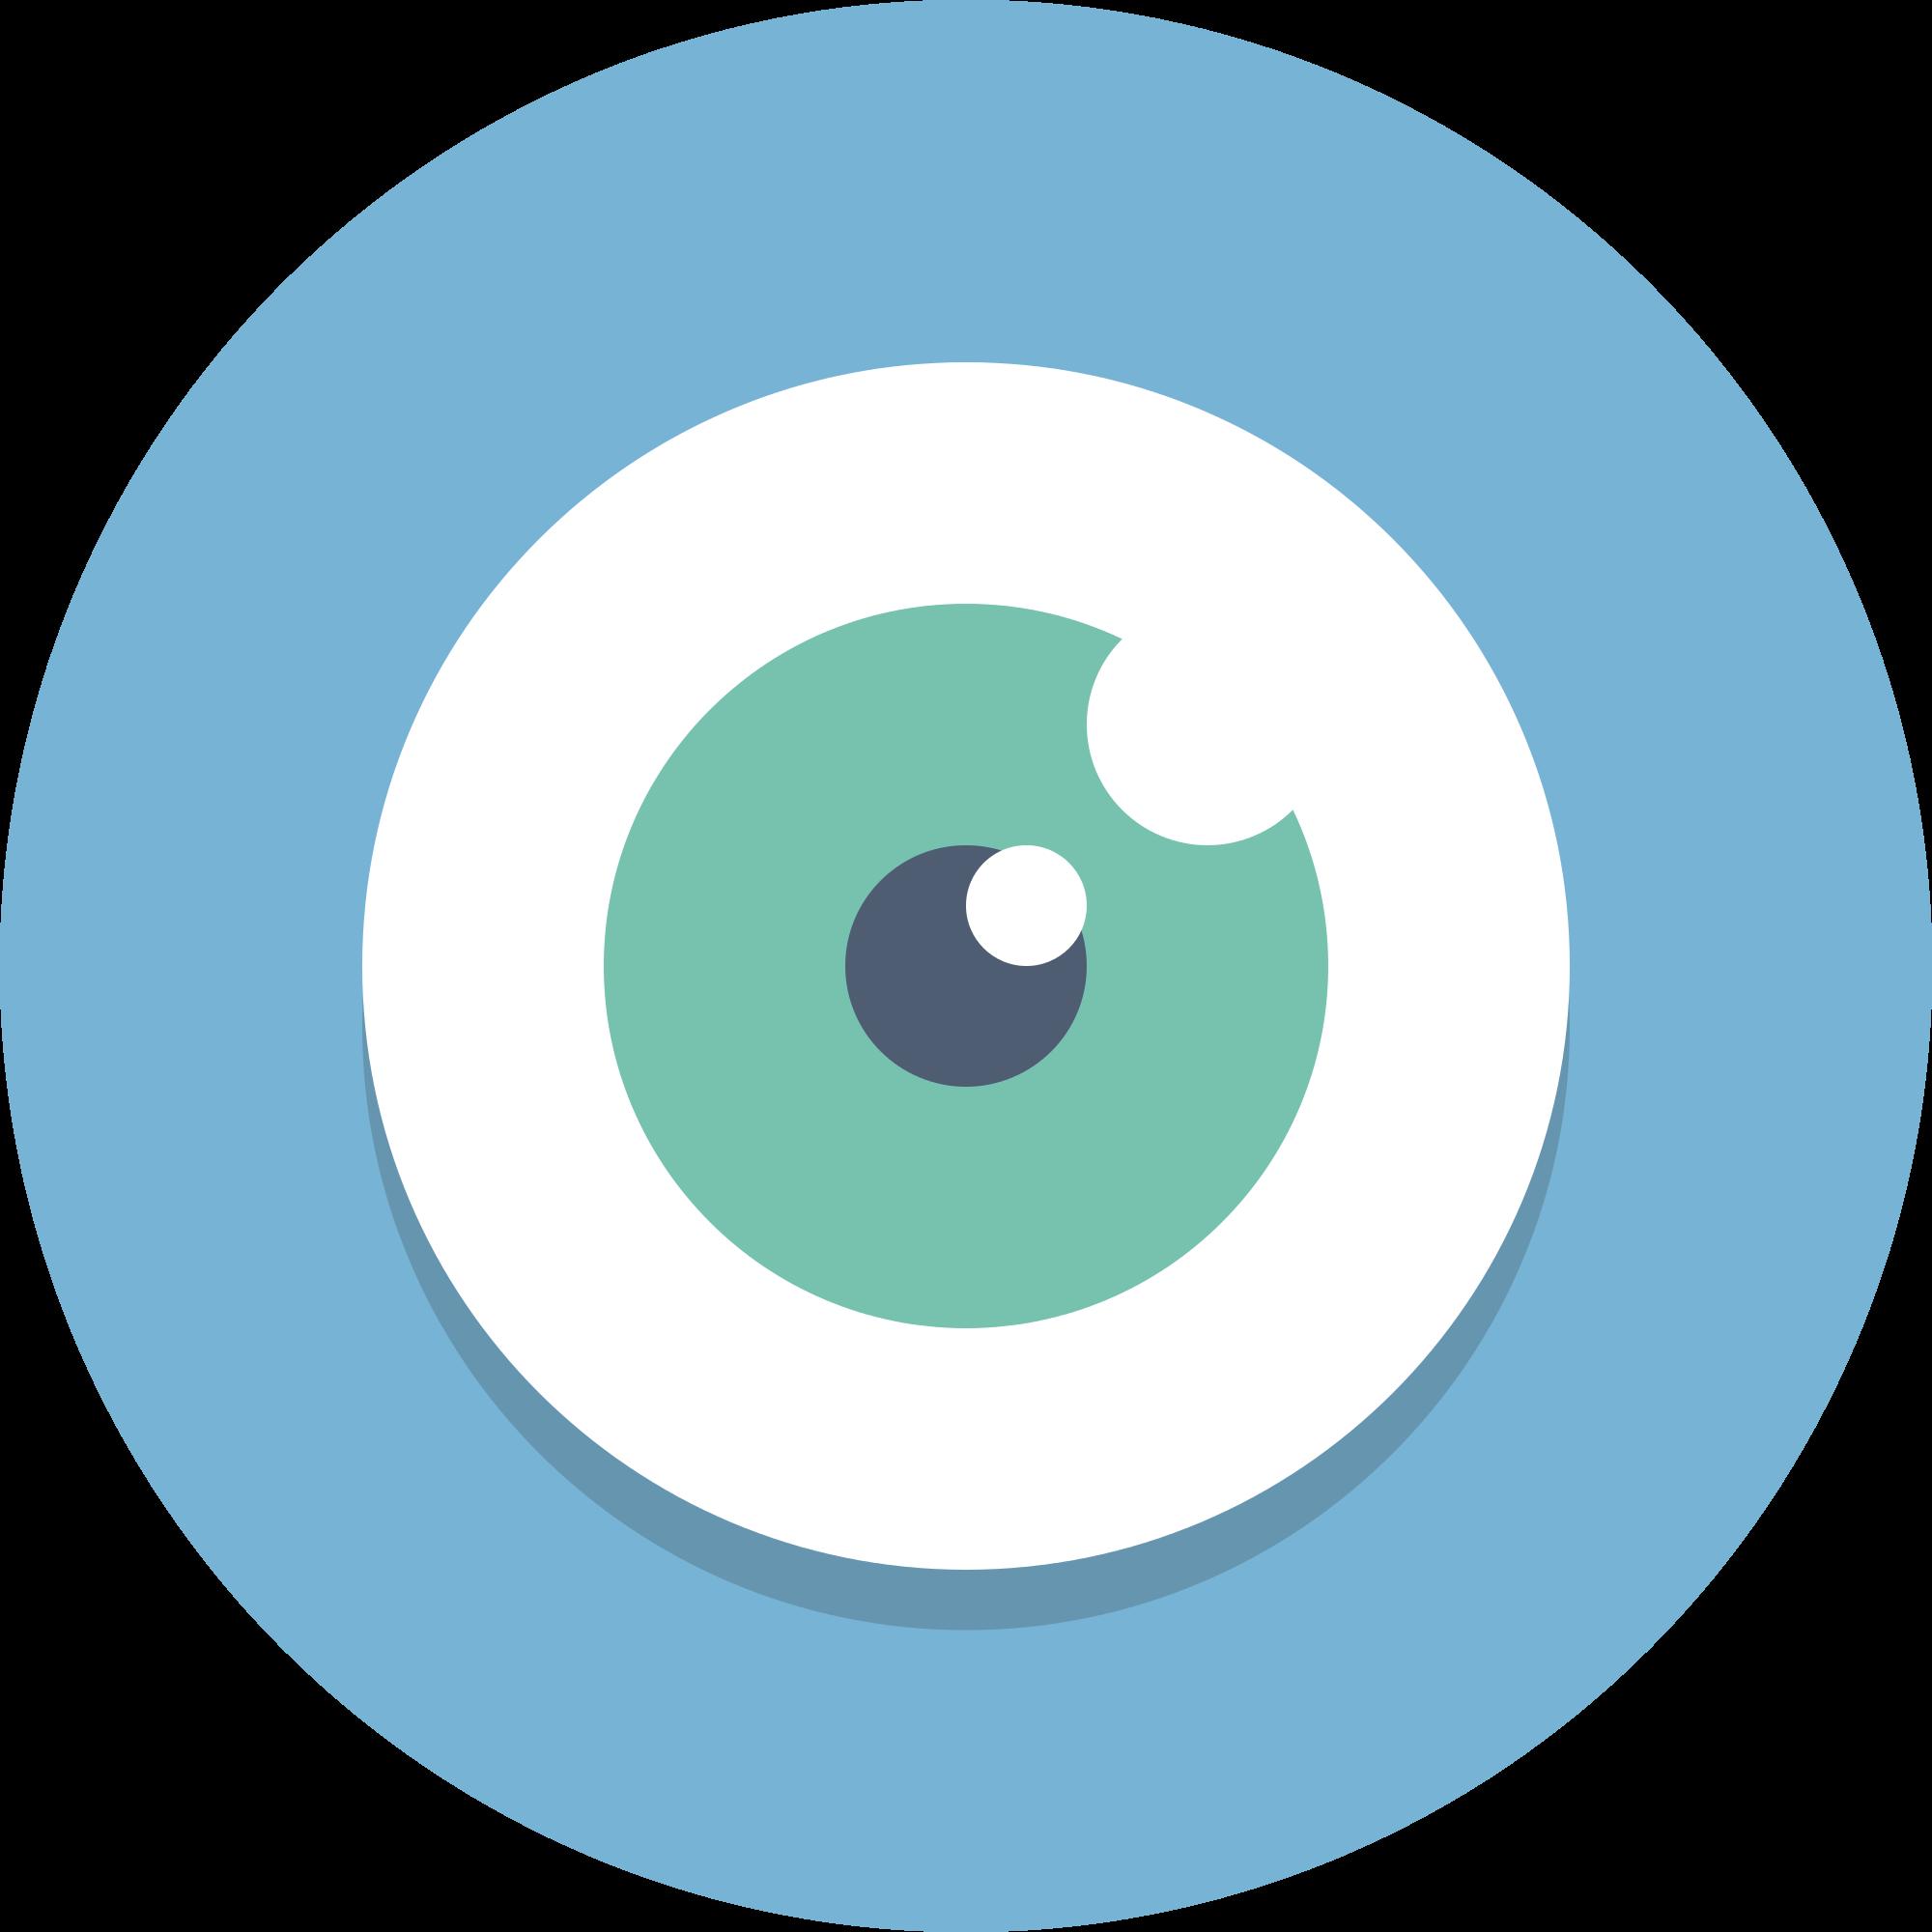 File Circle Icons Eye Svg Wikimedia Commons.